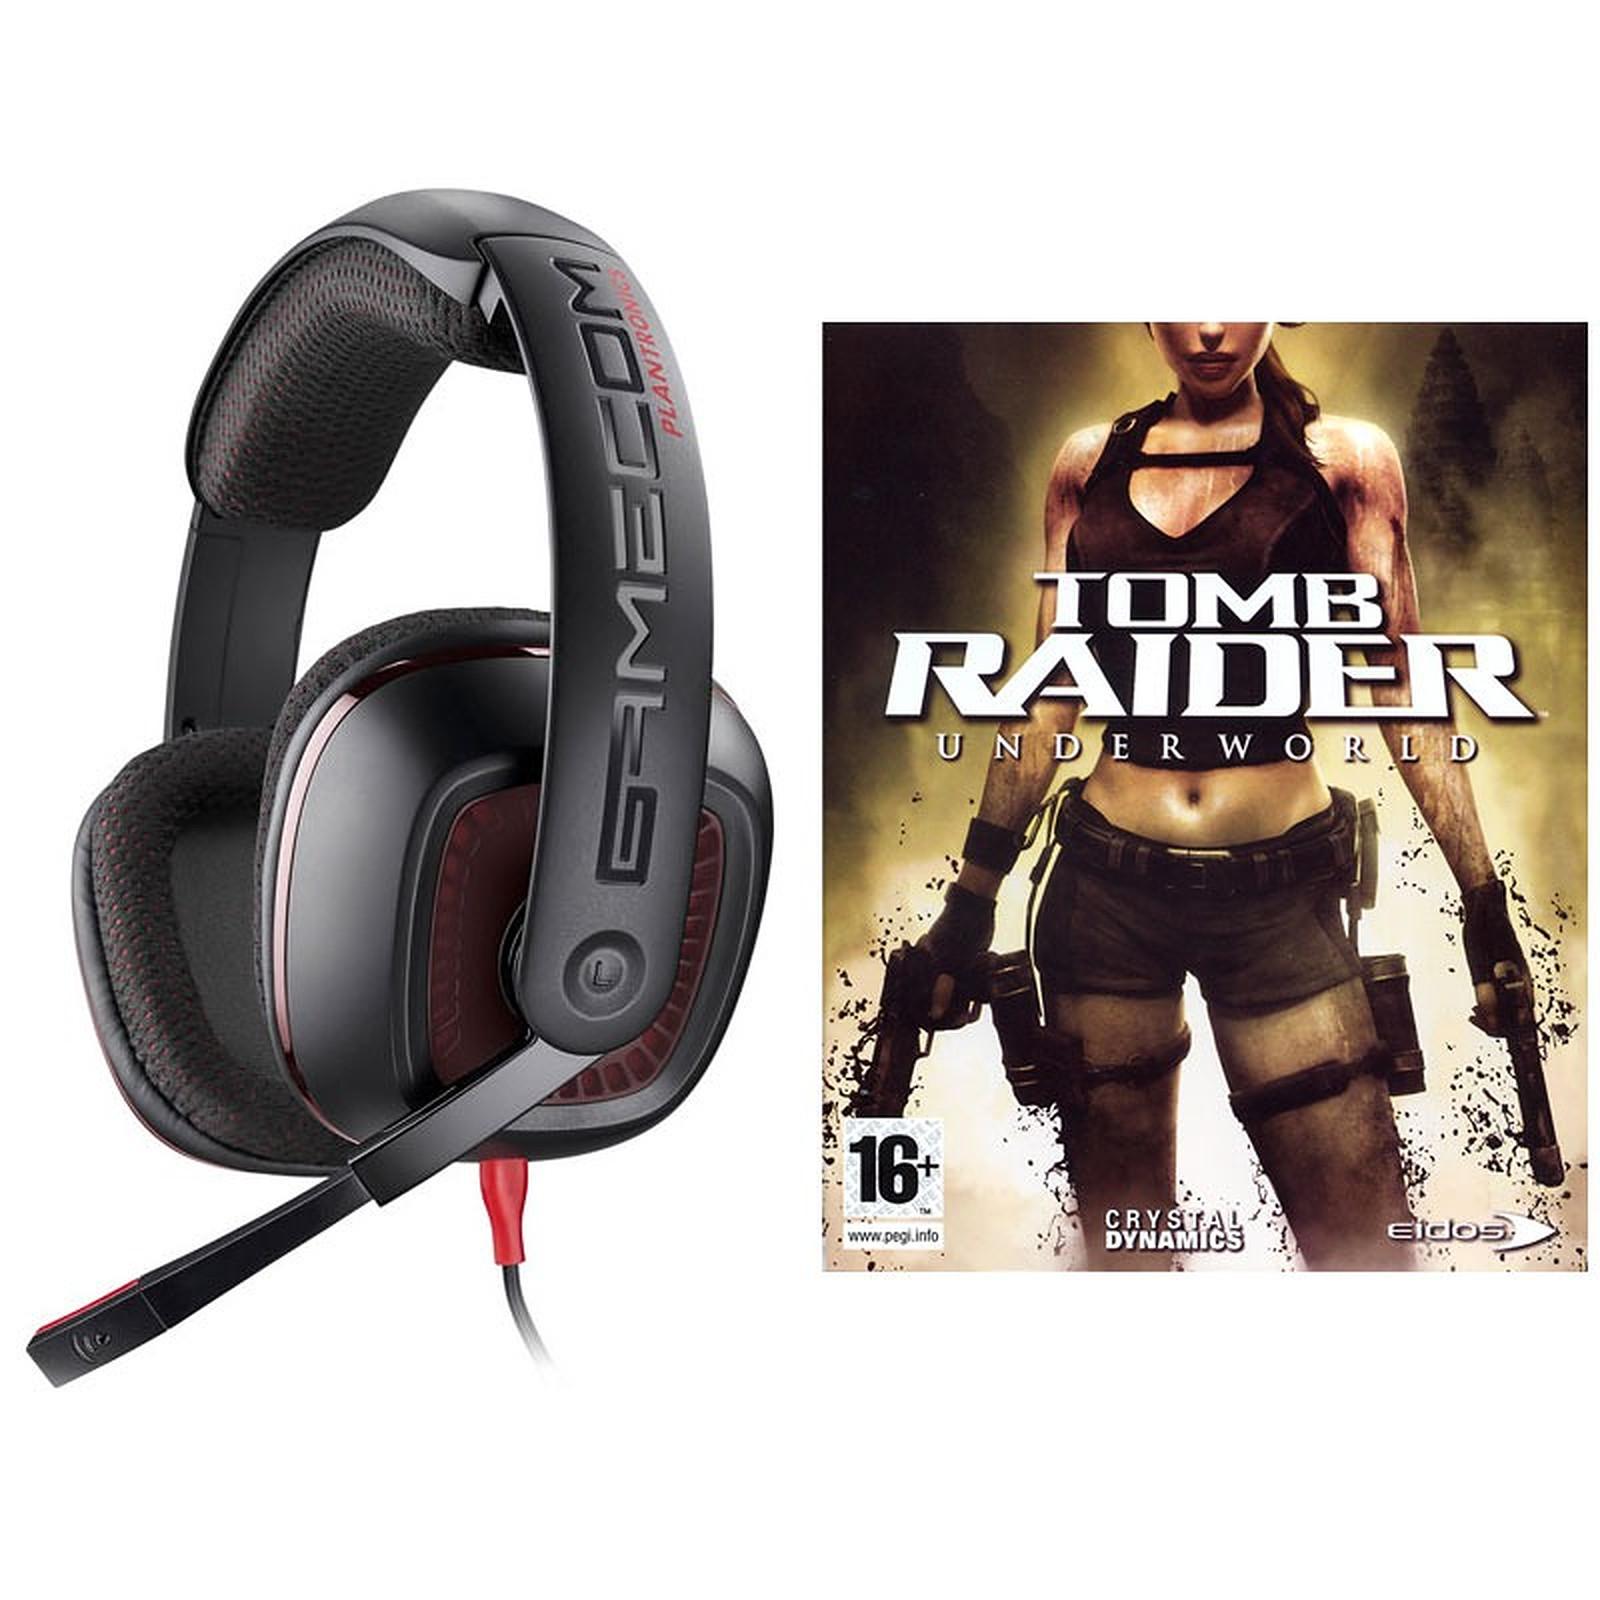 Plantronics GameCom 367 + Tomb Raider Underworld